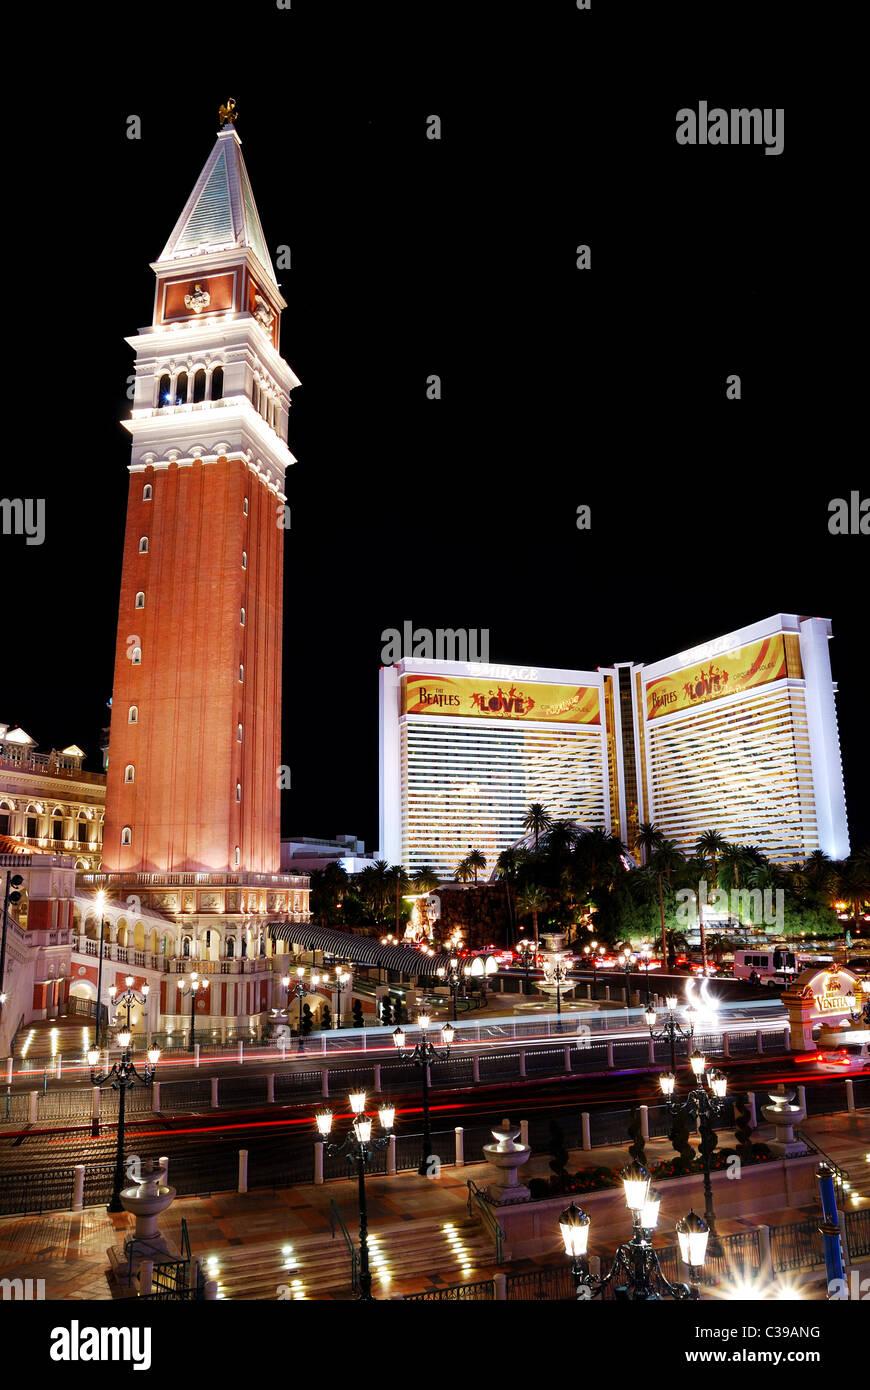 Clocks in las vegas gambling casinos casino lake map tahoe